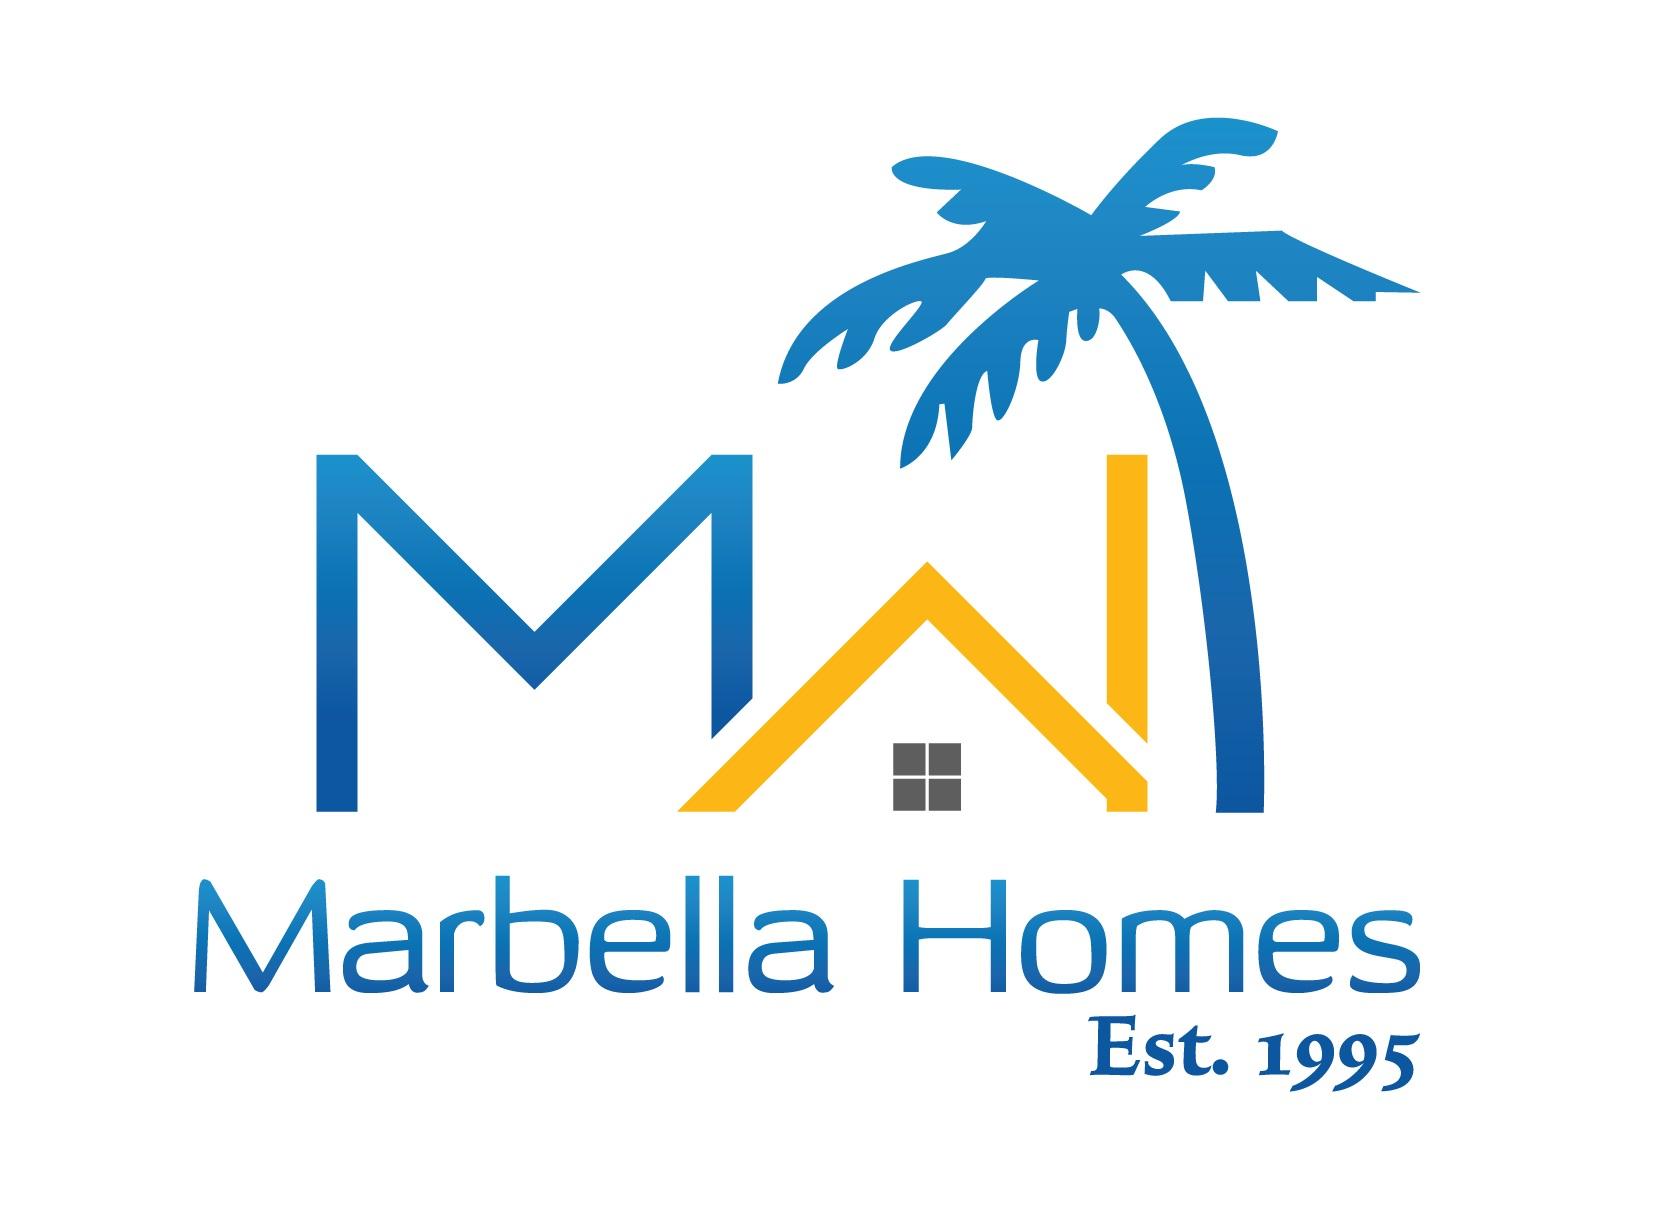 MARBELLA HOMES logo